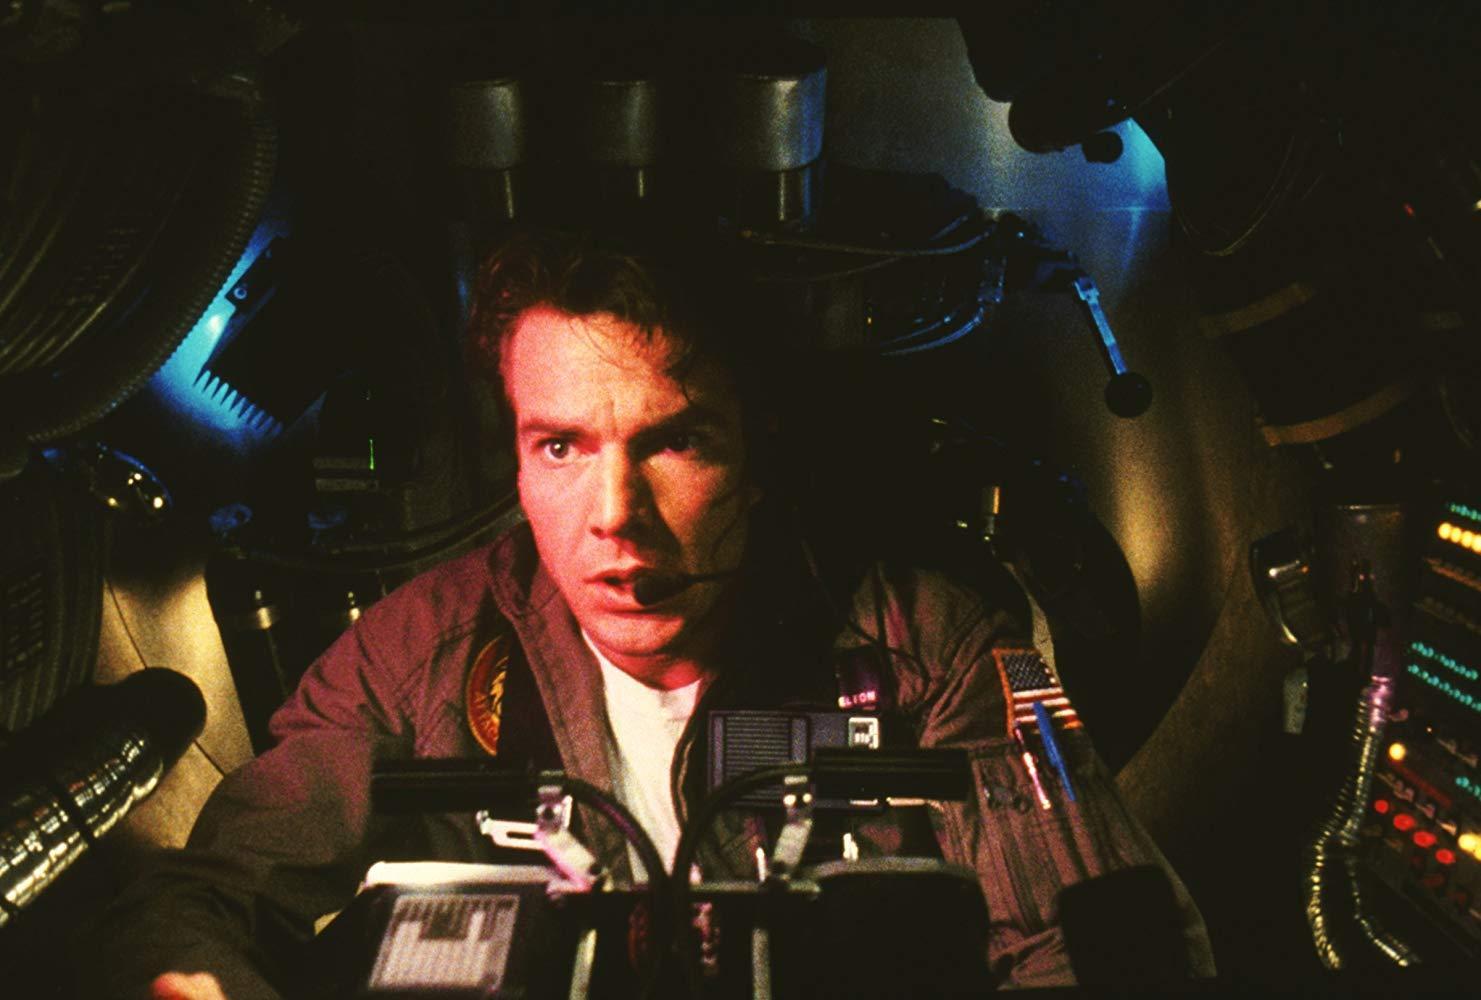 مشاهدة فيلم Innerspace 1987 HD مترجم كامل اون لاين